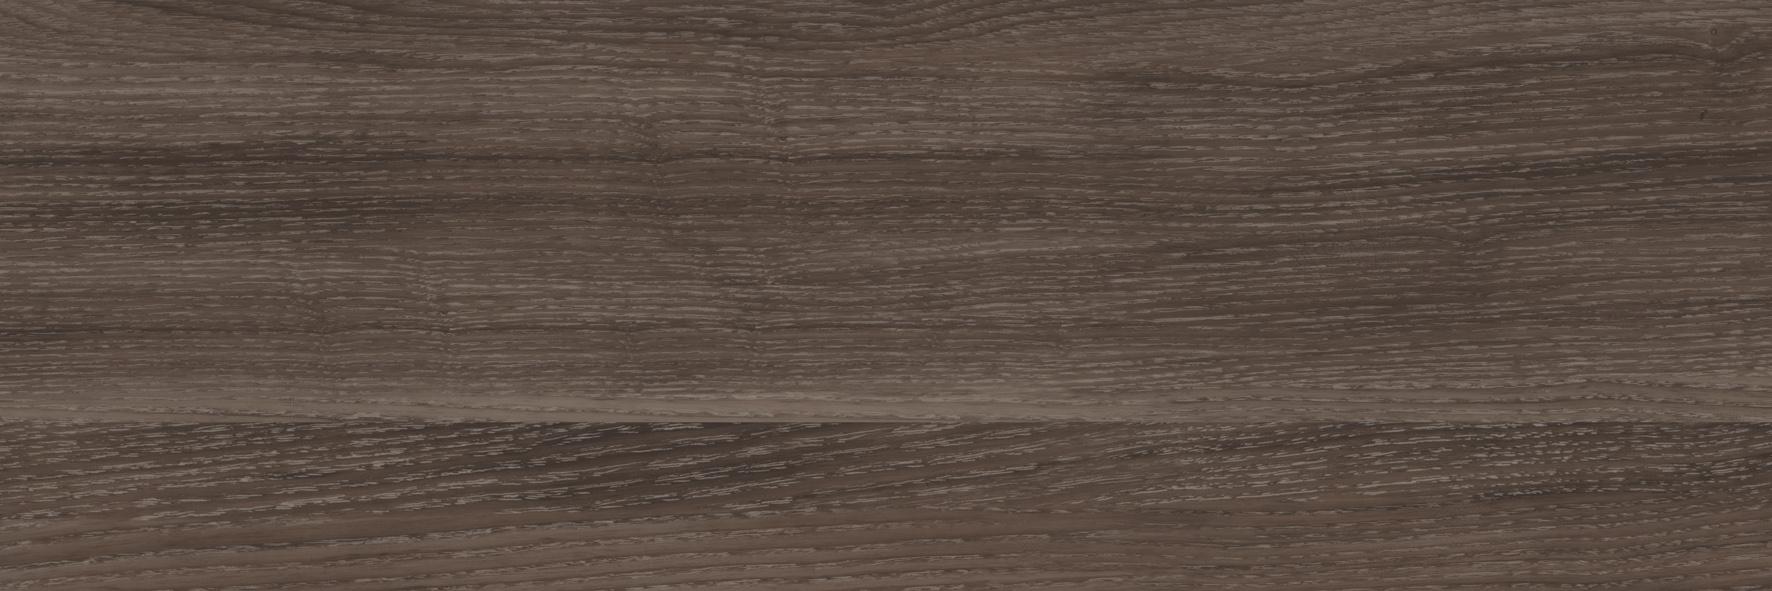 Palisandro Marrón · 19x57